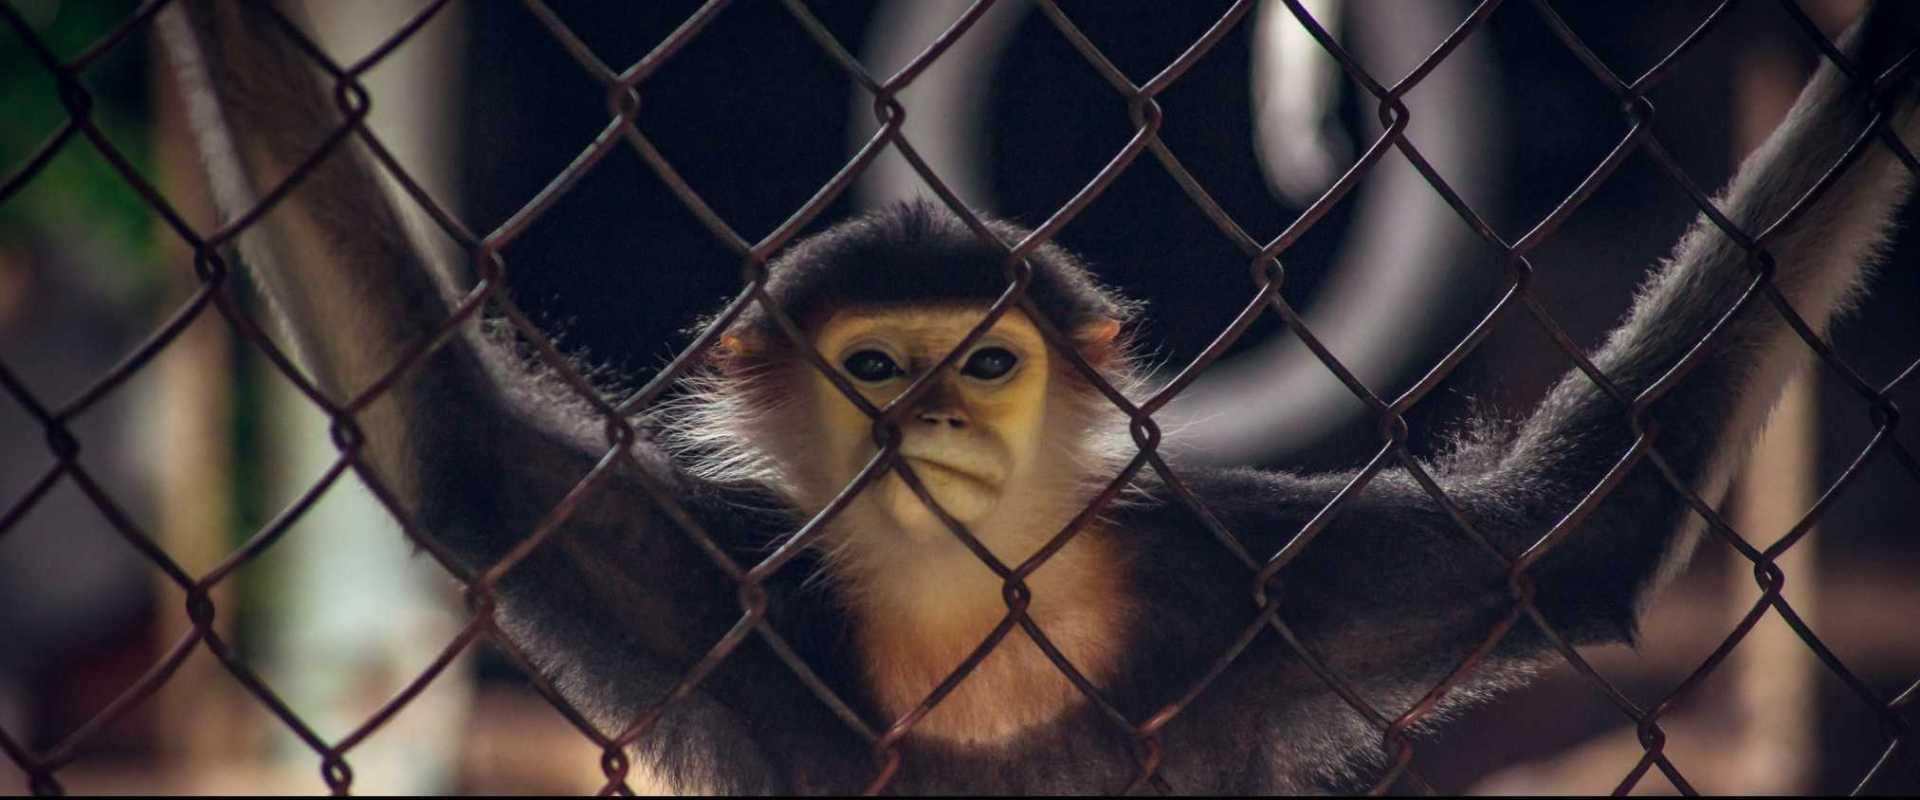 hayvanat bahçesi maymun